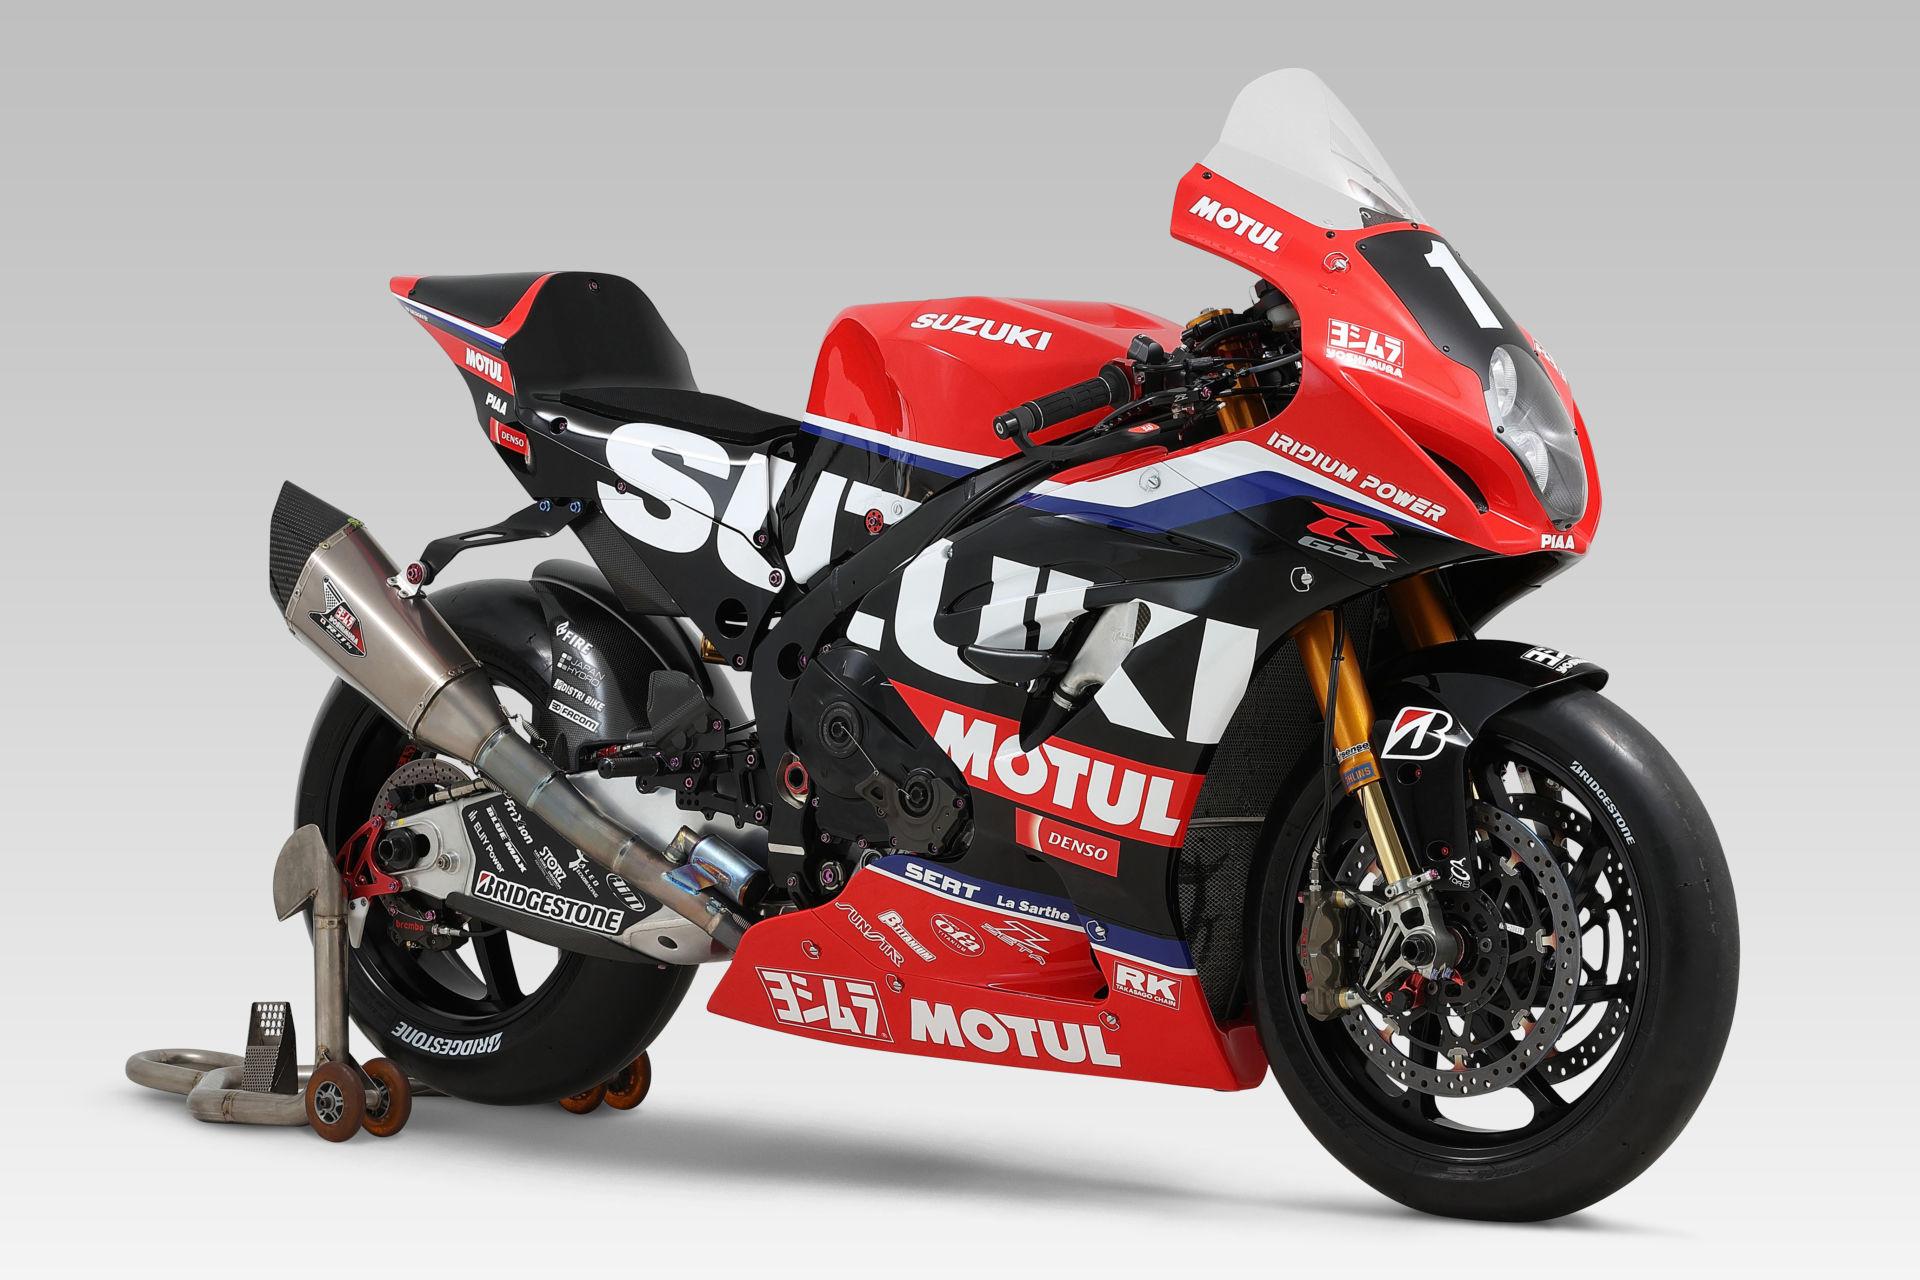 The Yoshimura SERT Motul Suzuki GSX-R1000. Photo courtesy Eurosport Events.